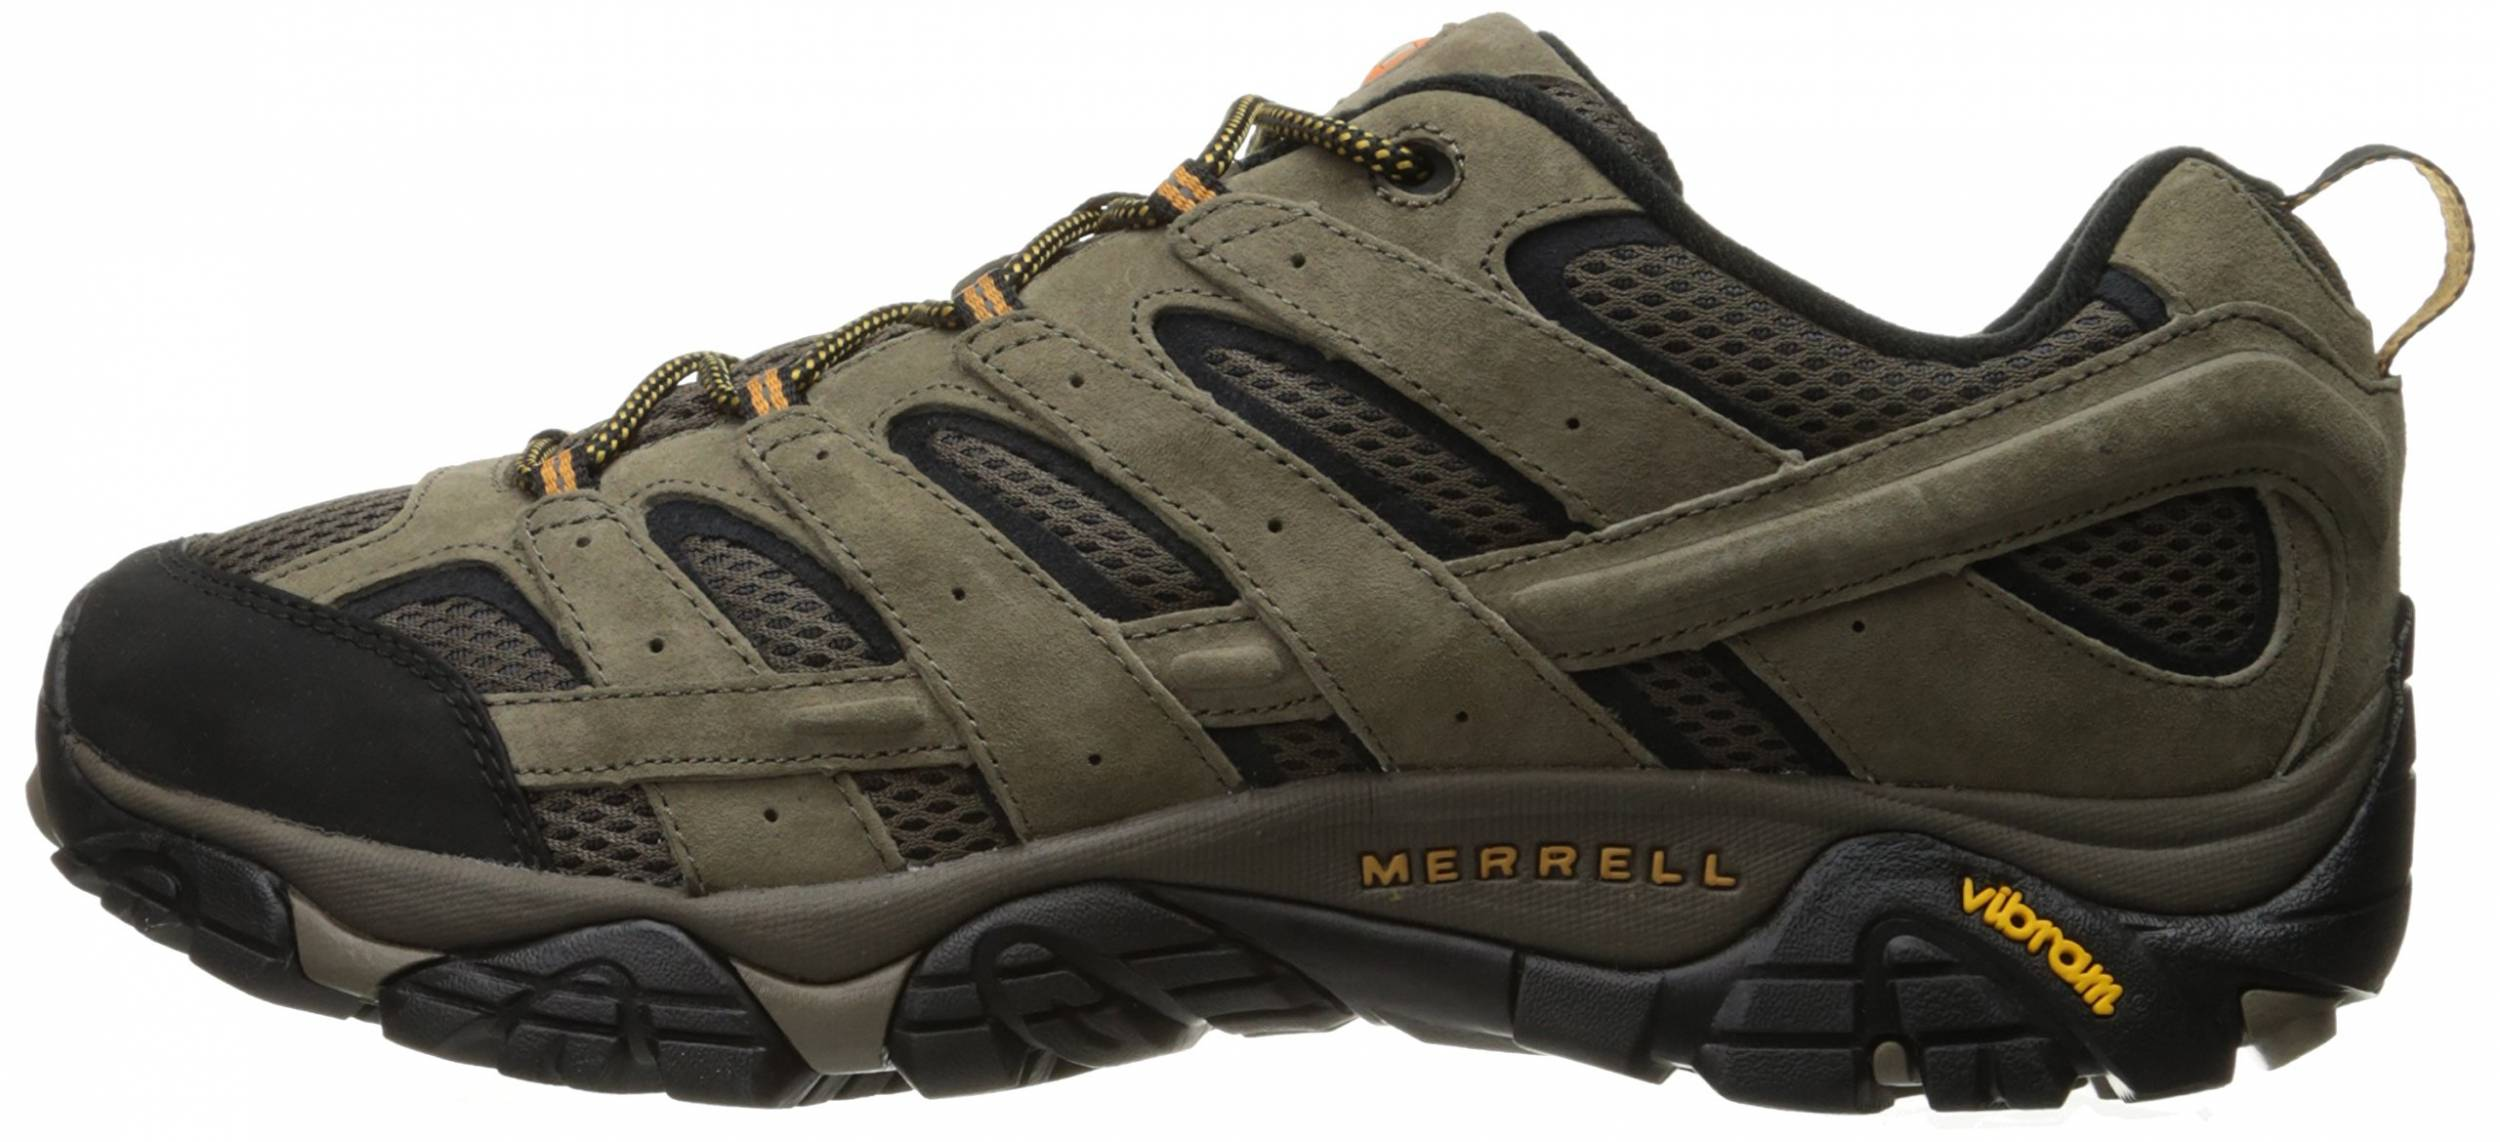 merrell moab 2 true to size women's